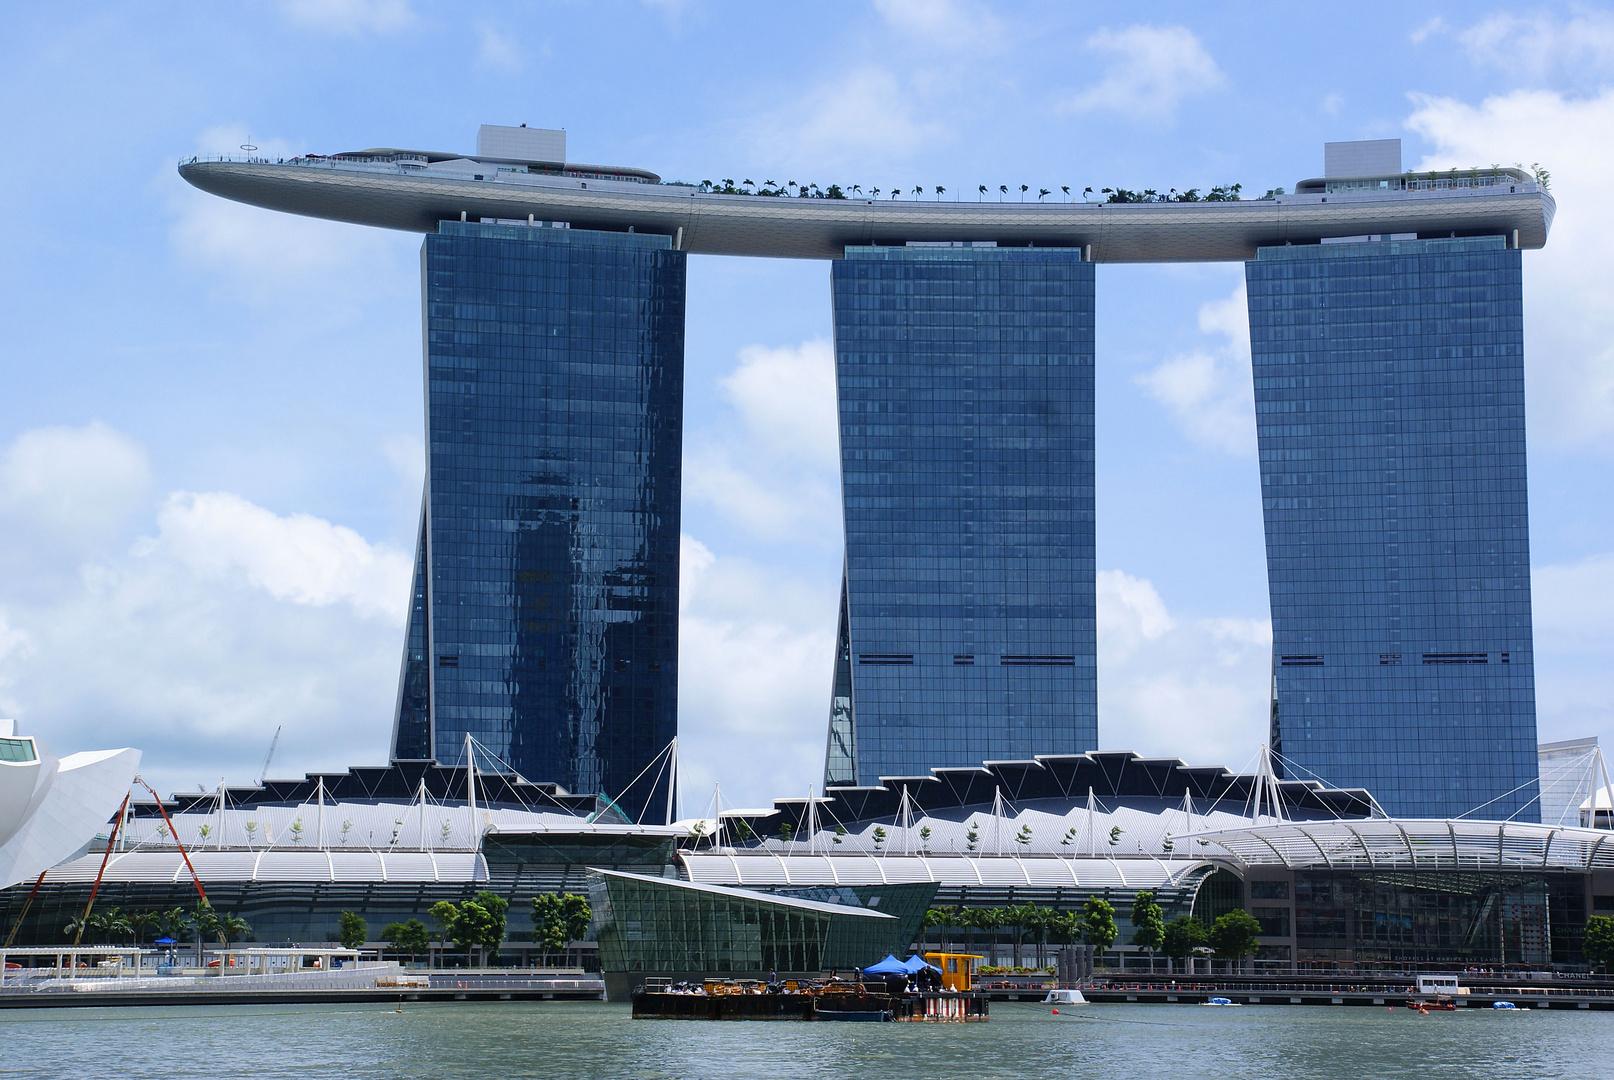 Singapur Sky Park